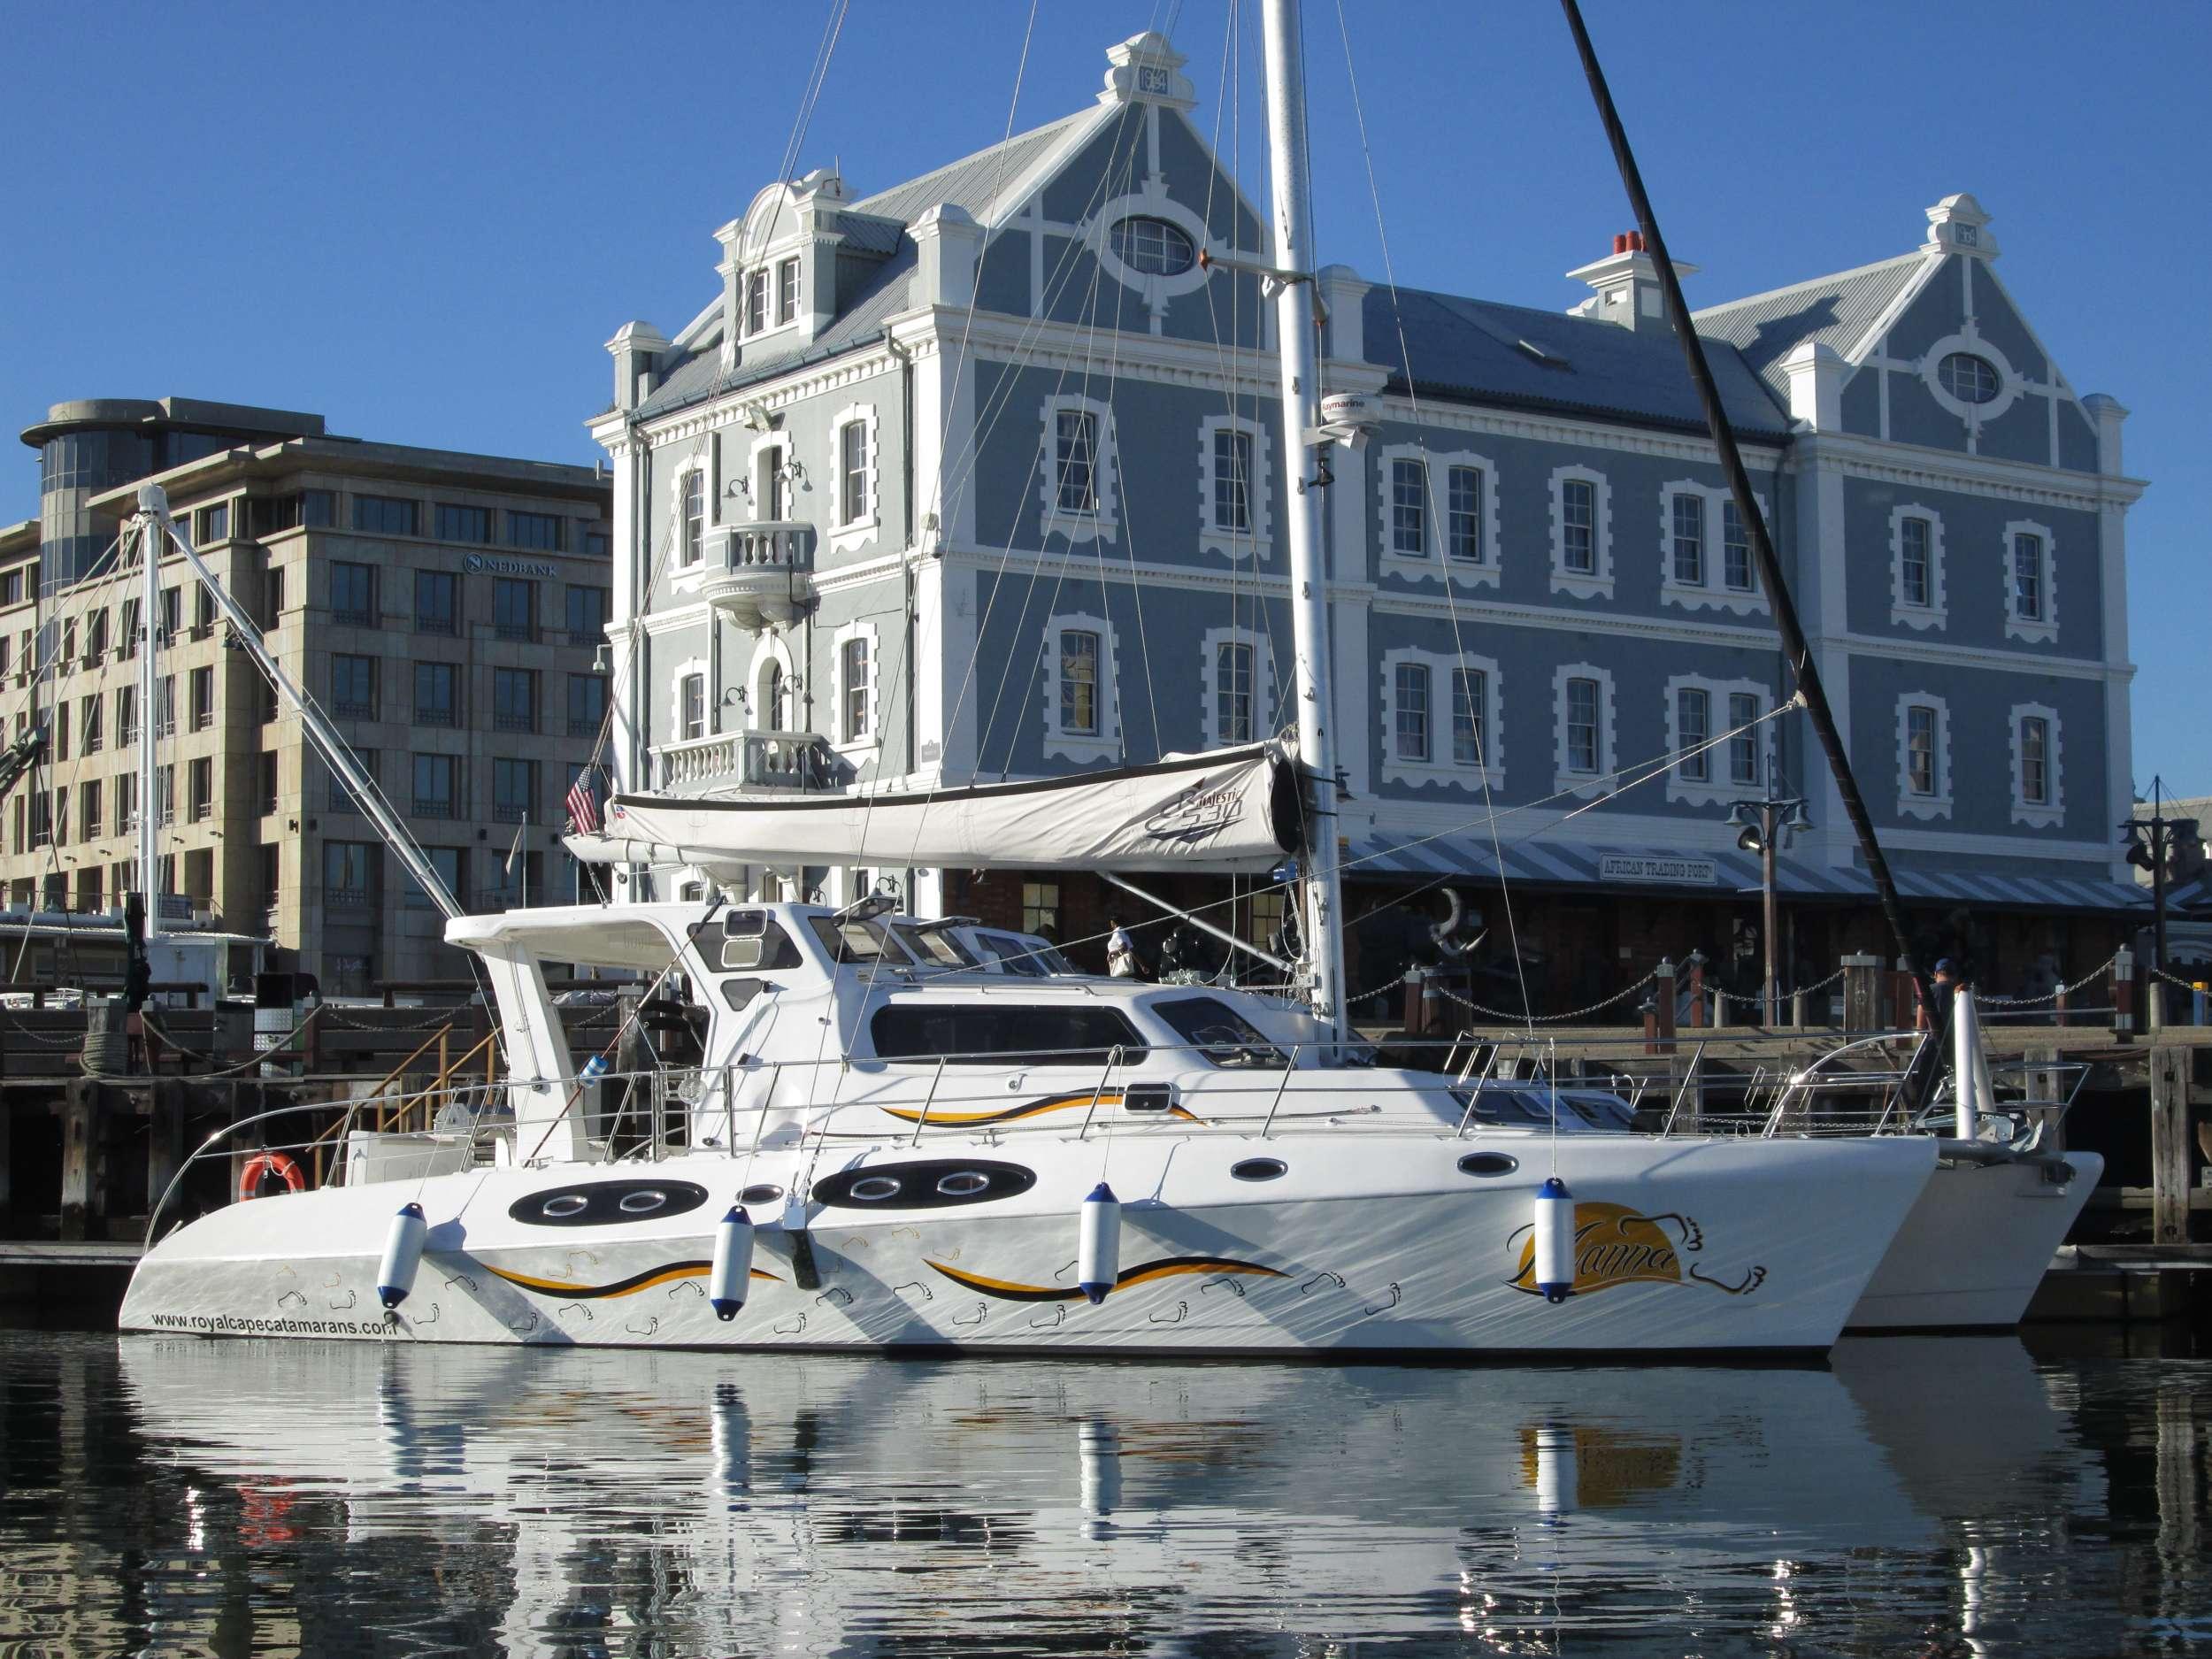 Main image of MANNA yacht